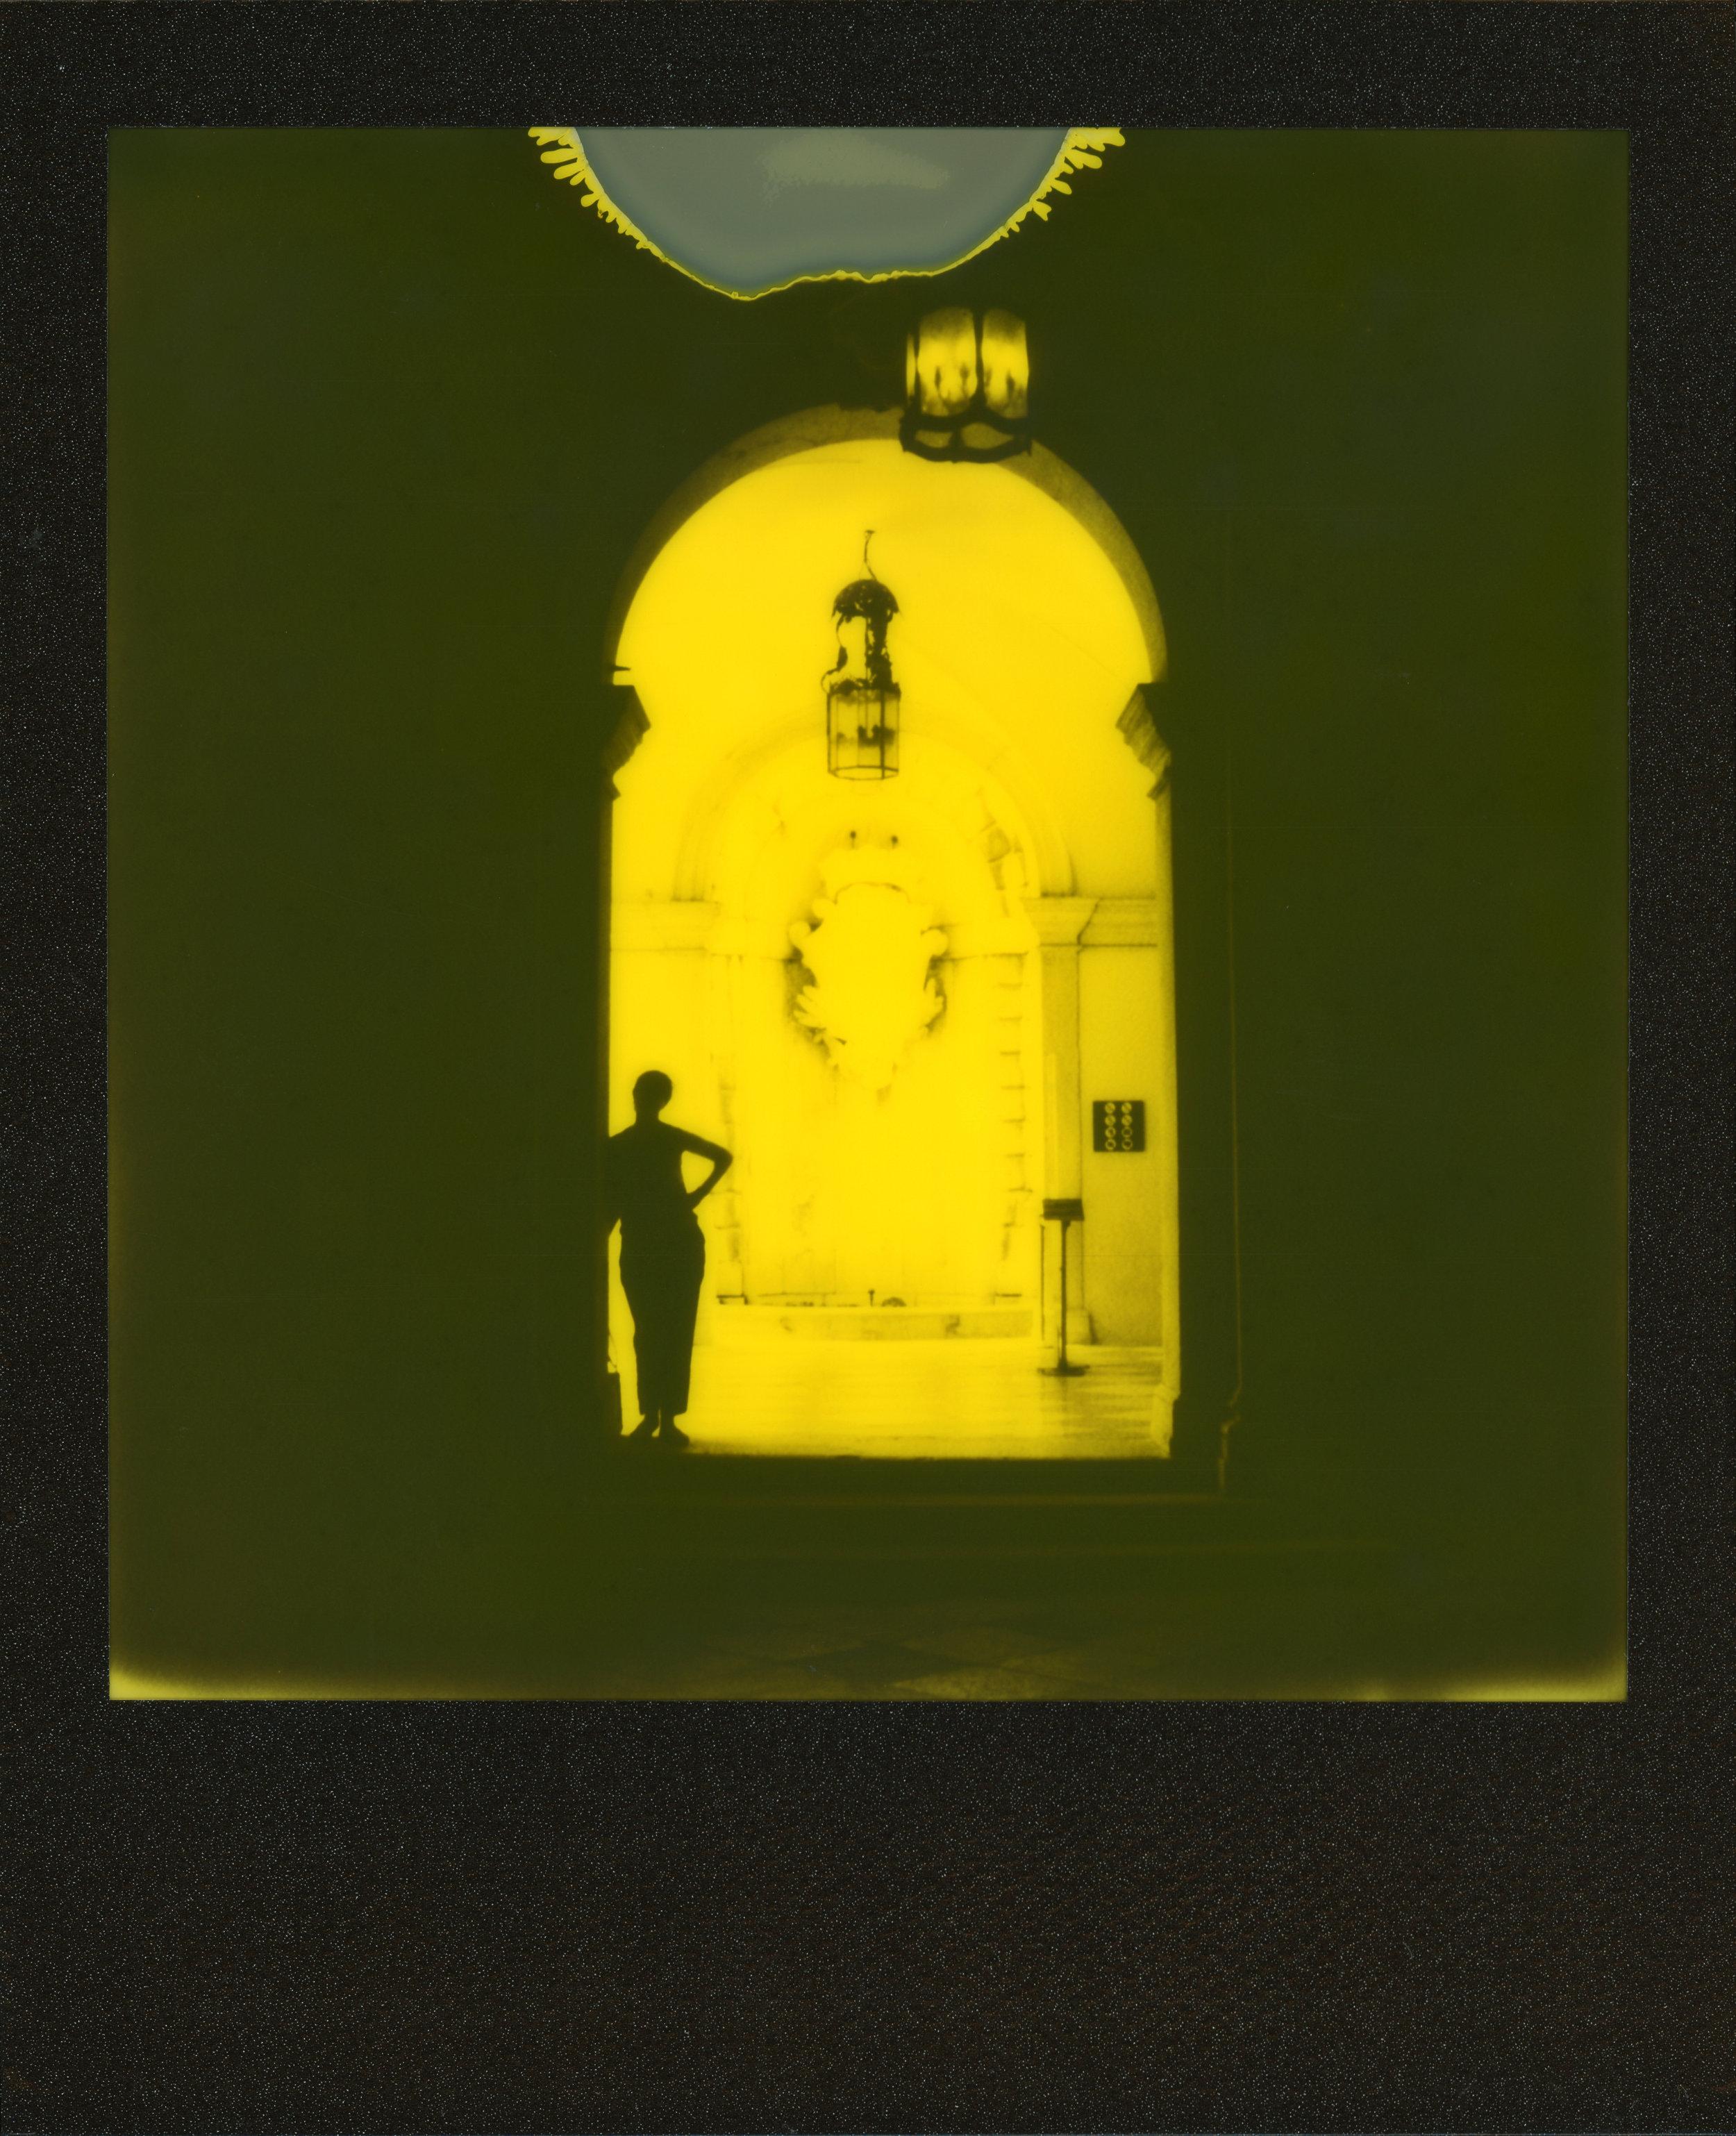 At Ca' Rezzonico | Polaroid SLR680 | Impossible Project Yellow Duochrome 600 | Marian Rainer-Harbach